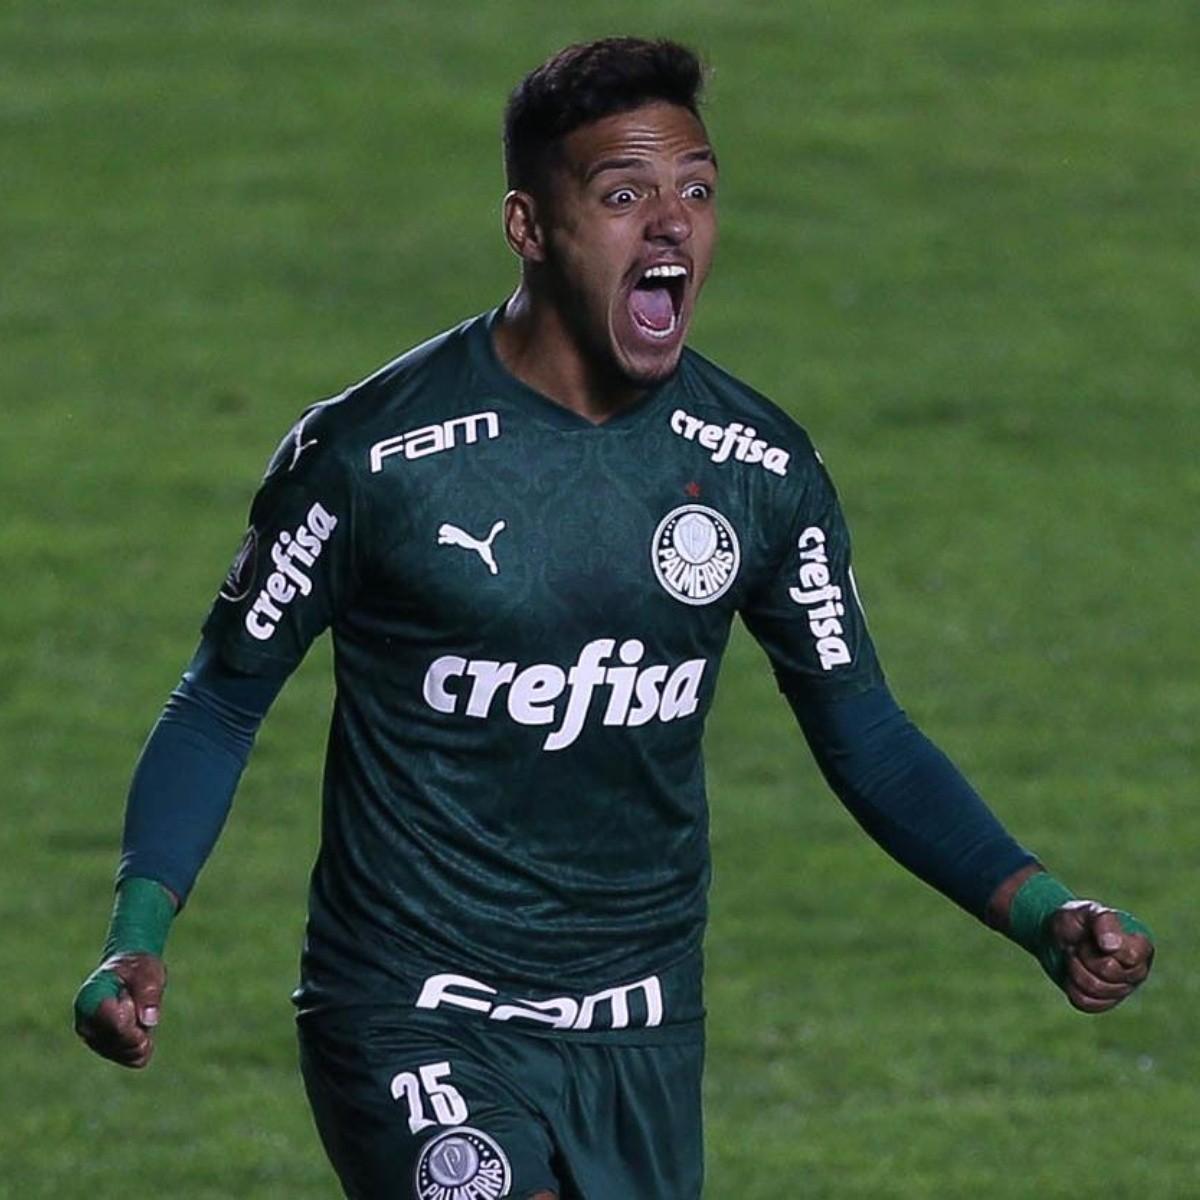 Inteligencia E Garra Garantem Vitoria Do Palmeiras Na Altitude De La Paz Bolavip Brasil